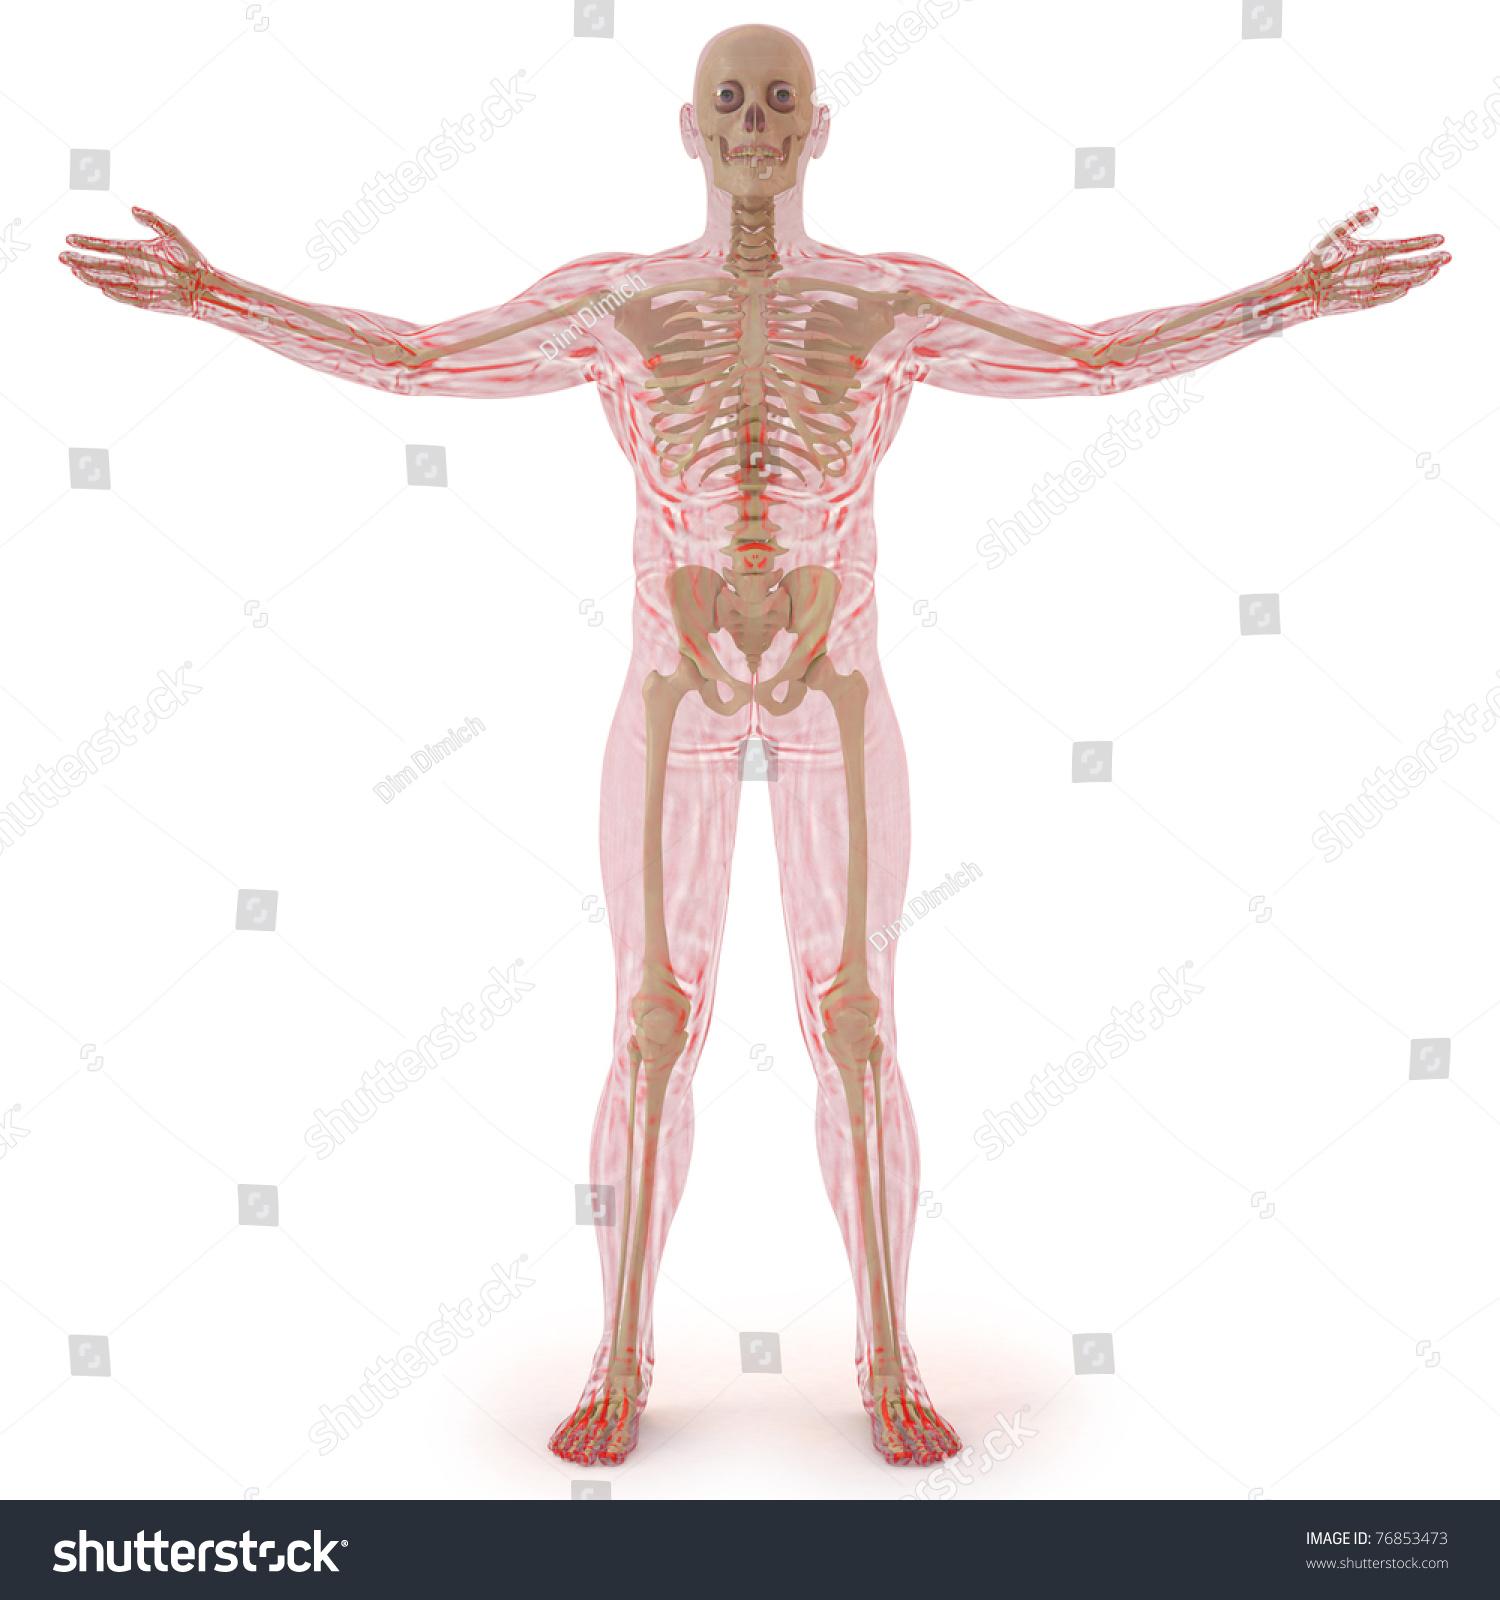 Translucent Human Body Visible Bones Isolated Stockillustration